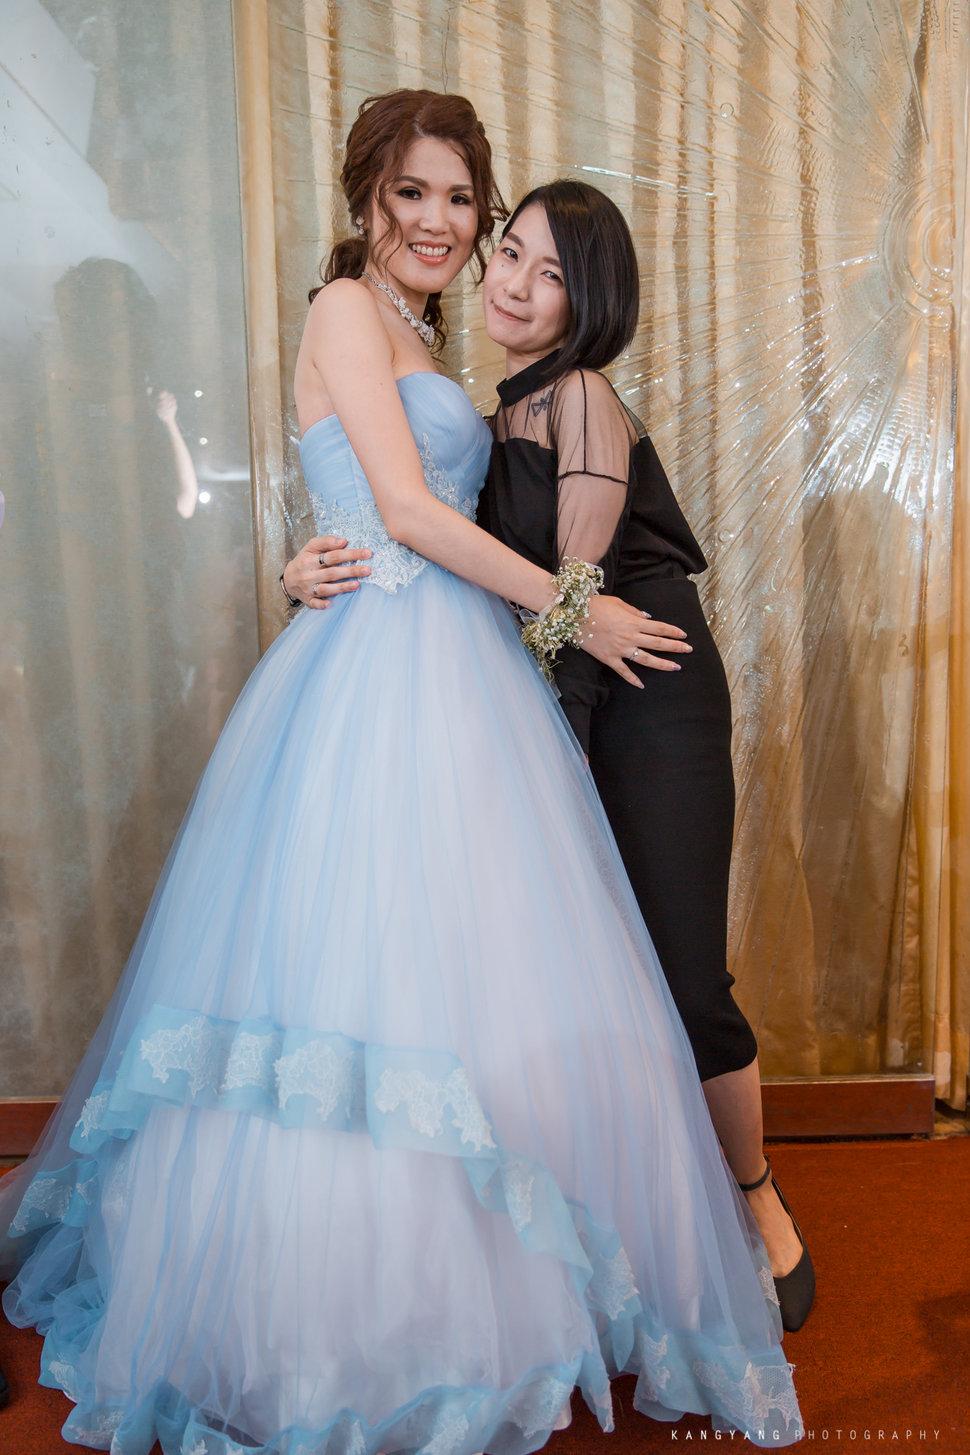 U&M 戶外證婚教堂婚禮@台北青青食尚花園/費加洛教堂(編號:307145) - 婚攝楊康影像Kstudio《結婚吧》